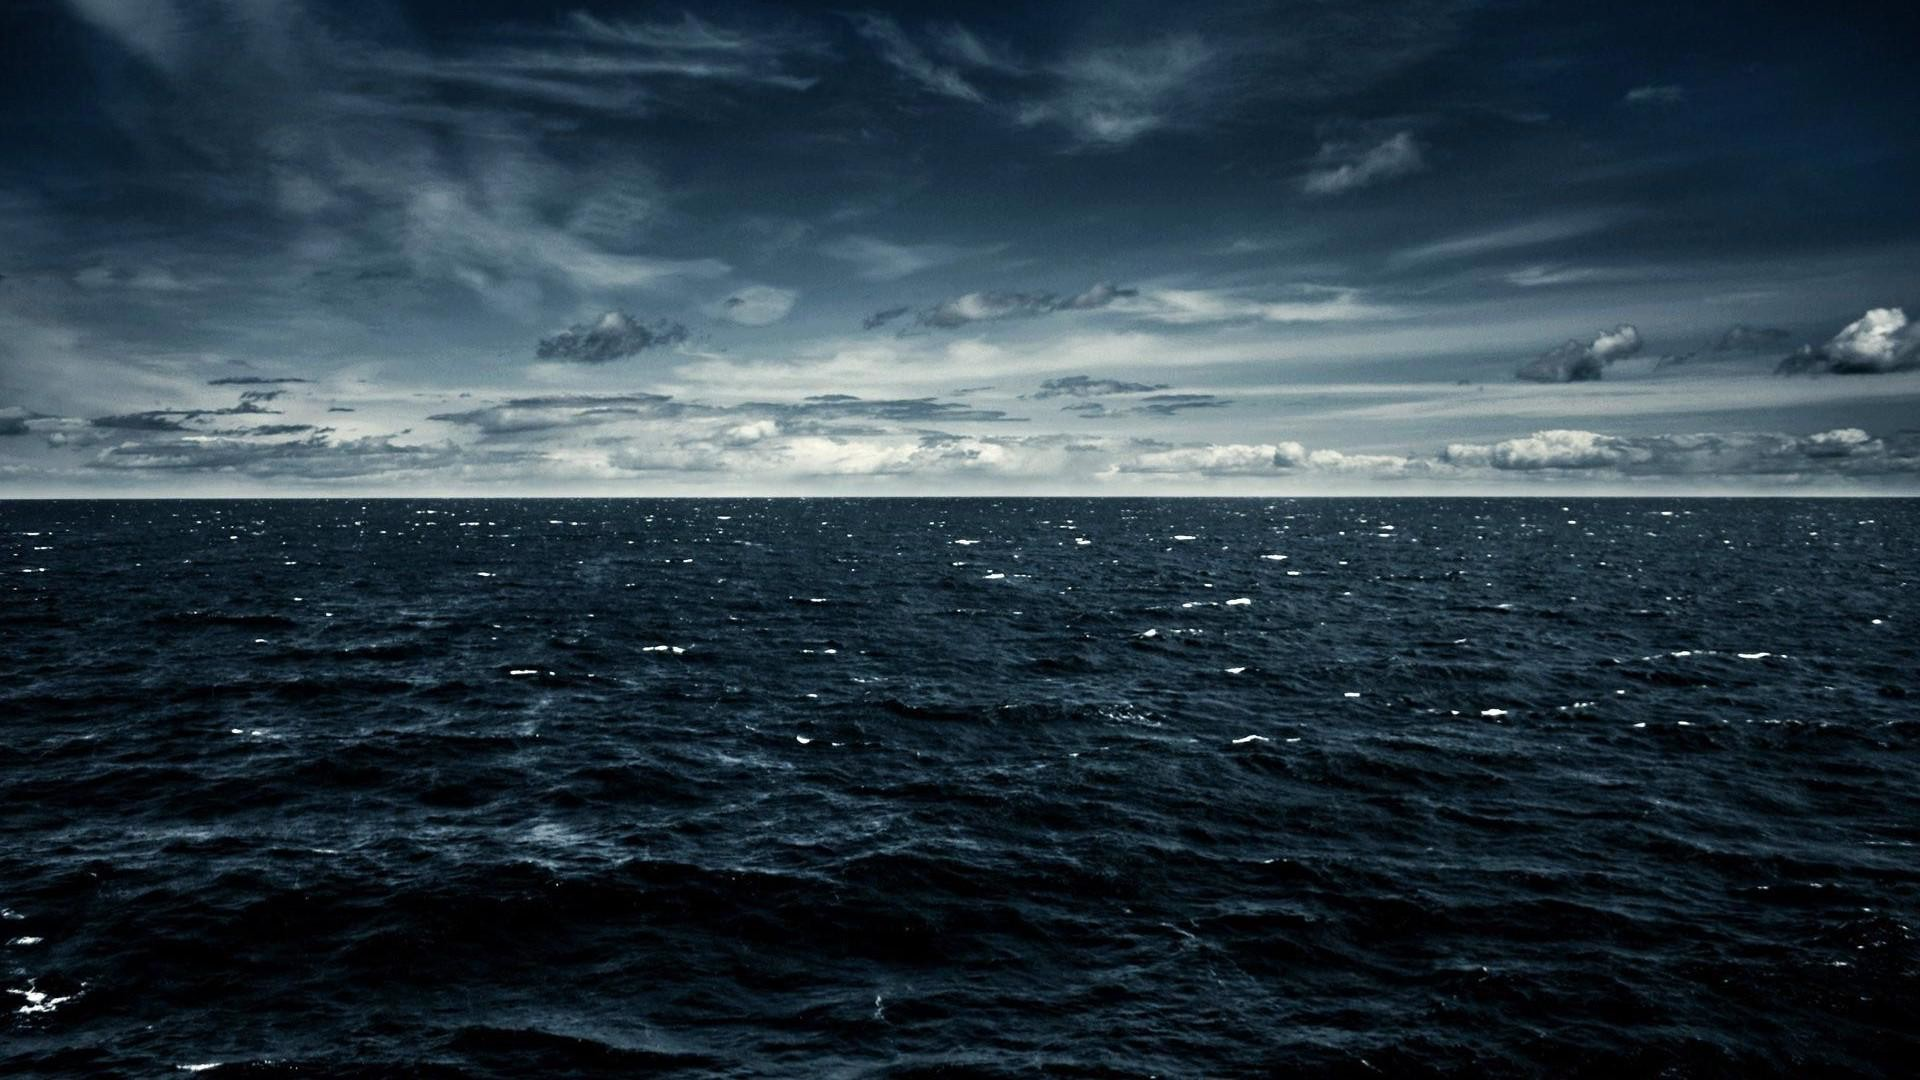 Hd Wallpapers Ocean 73 Images